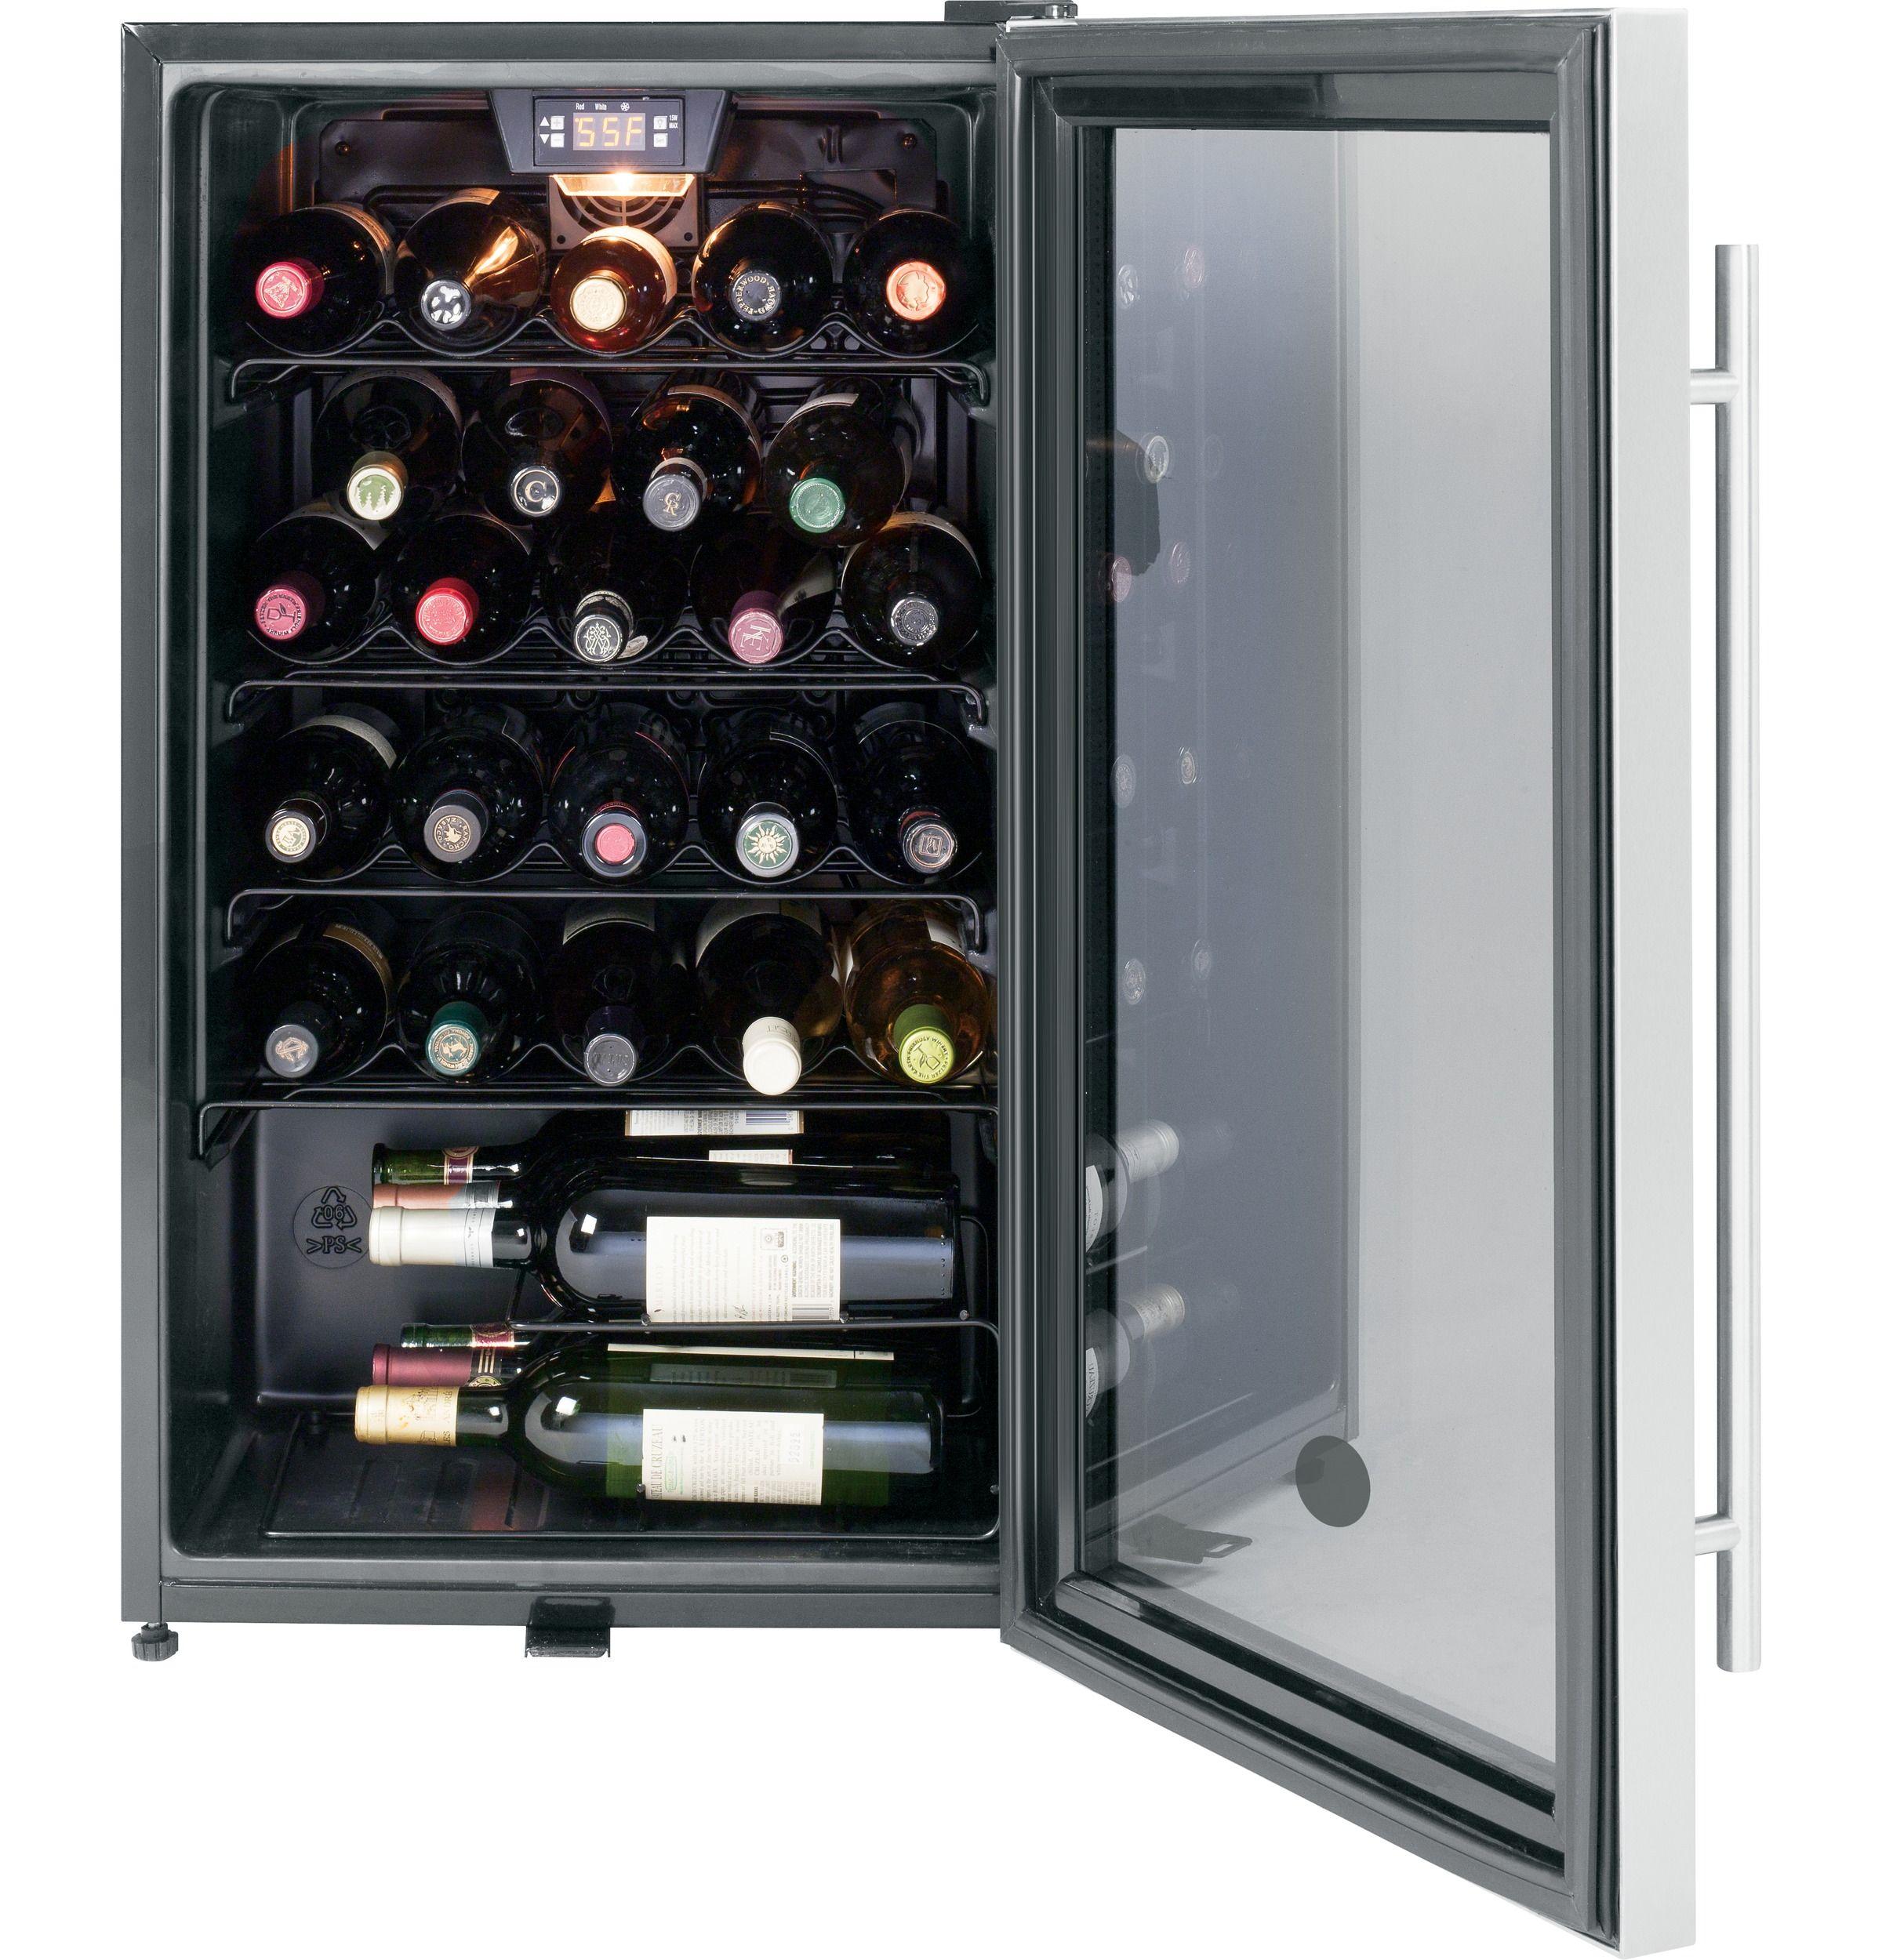 GWS04HAESS GE® Wine Center GE Appliances Wine cooler